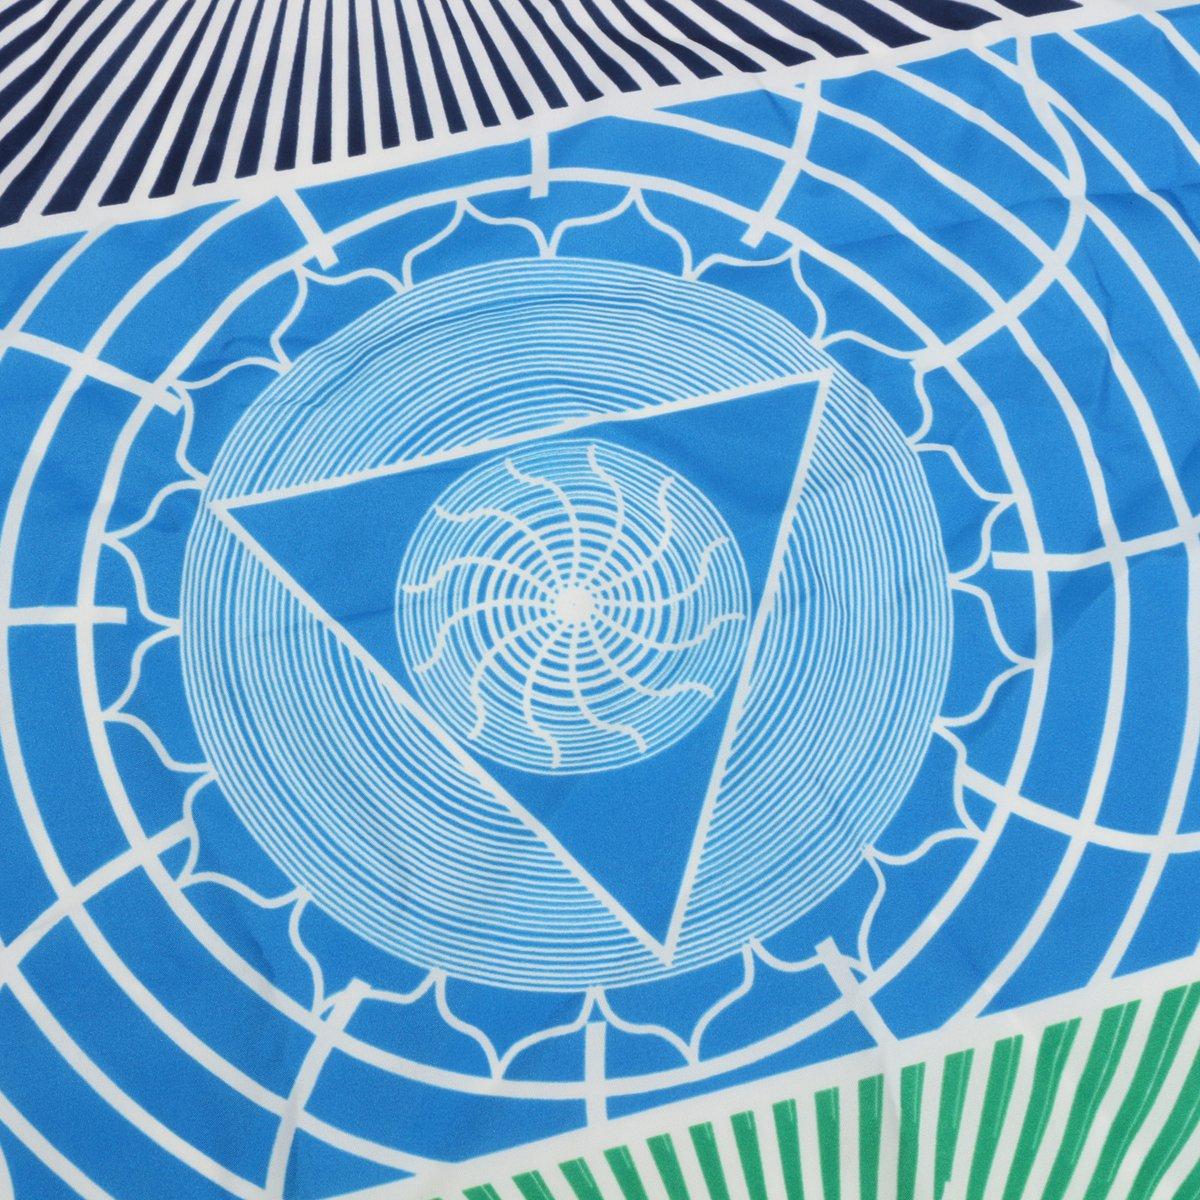 Jeteven Regenbogen Strandtuch boho Yoga 7 Chakras Teppich Handtuch Tapisserie Badetuch Zigeuner Sonnenschutz Schal 150*75cm bunt (A)